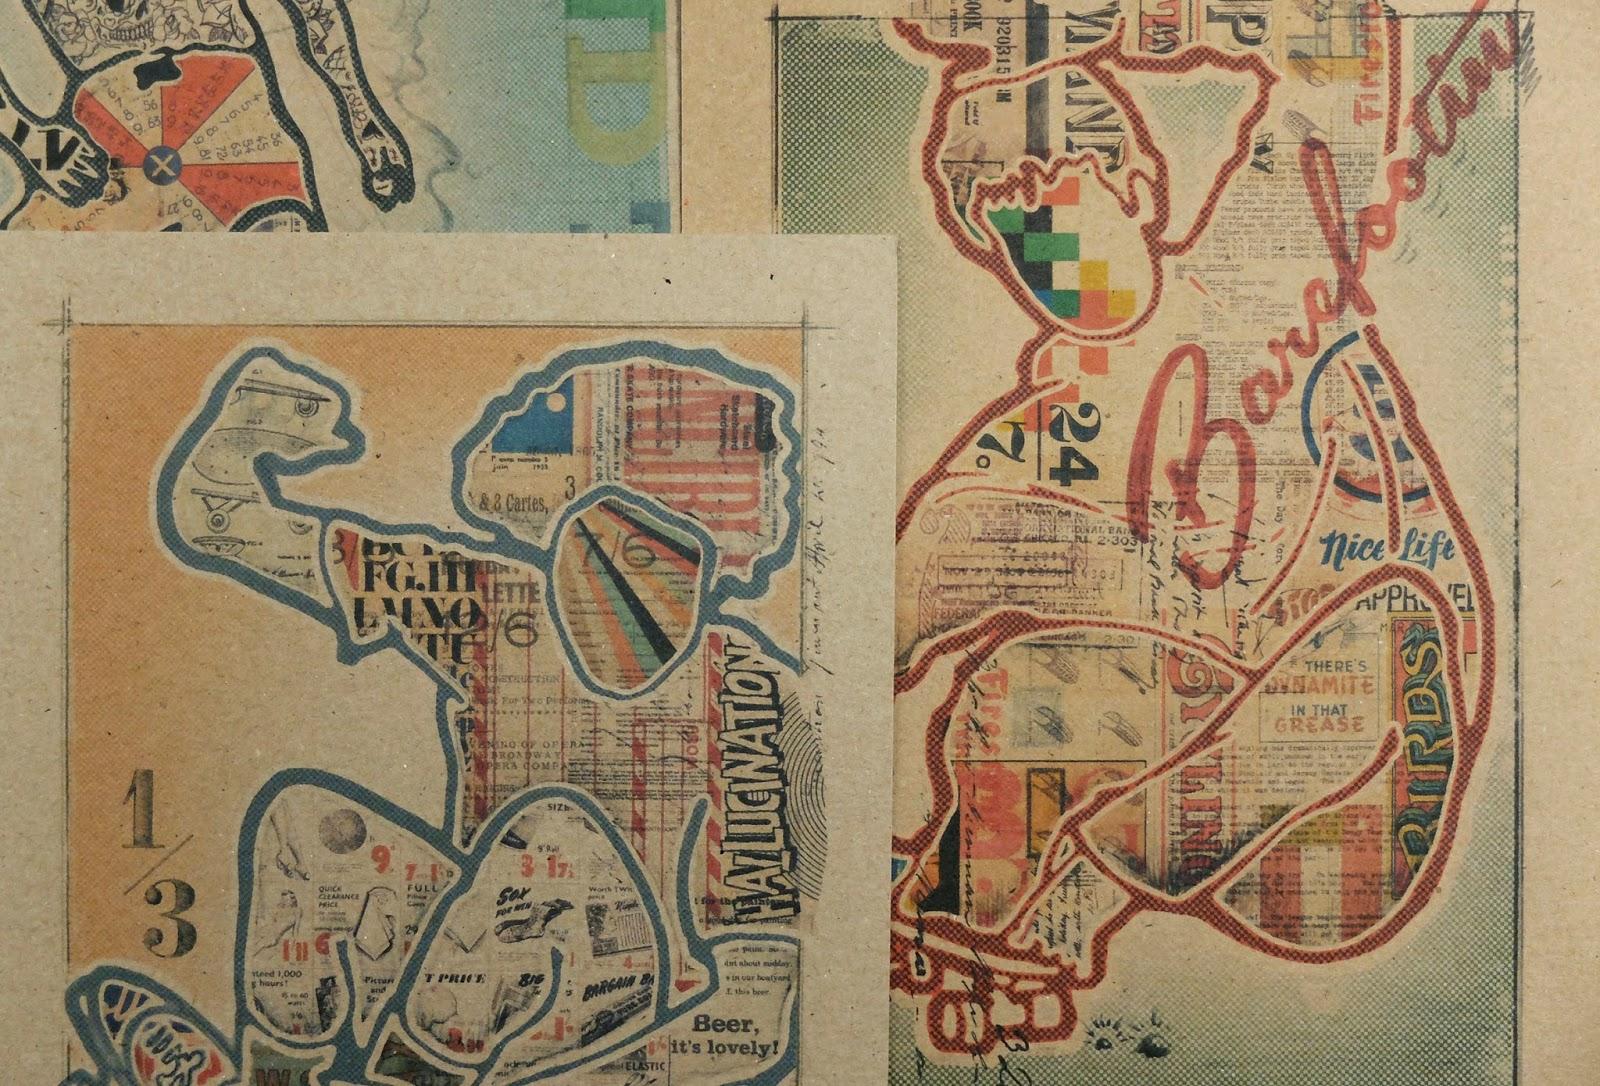 Test prints, skateboarding art, recycle paper